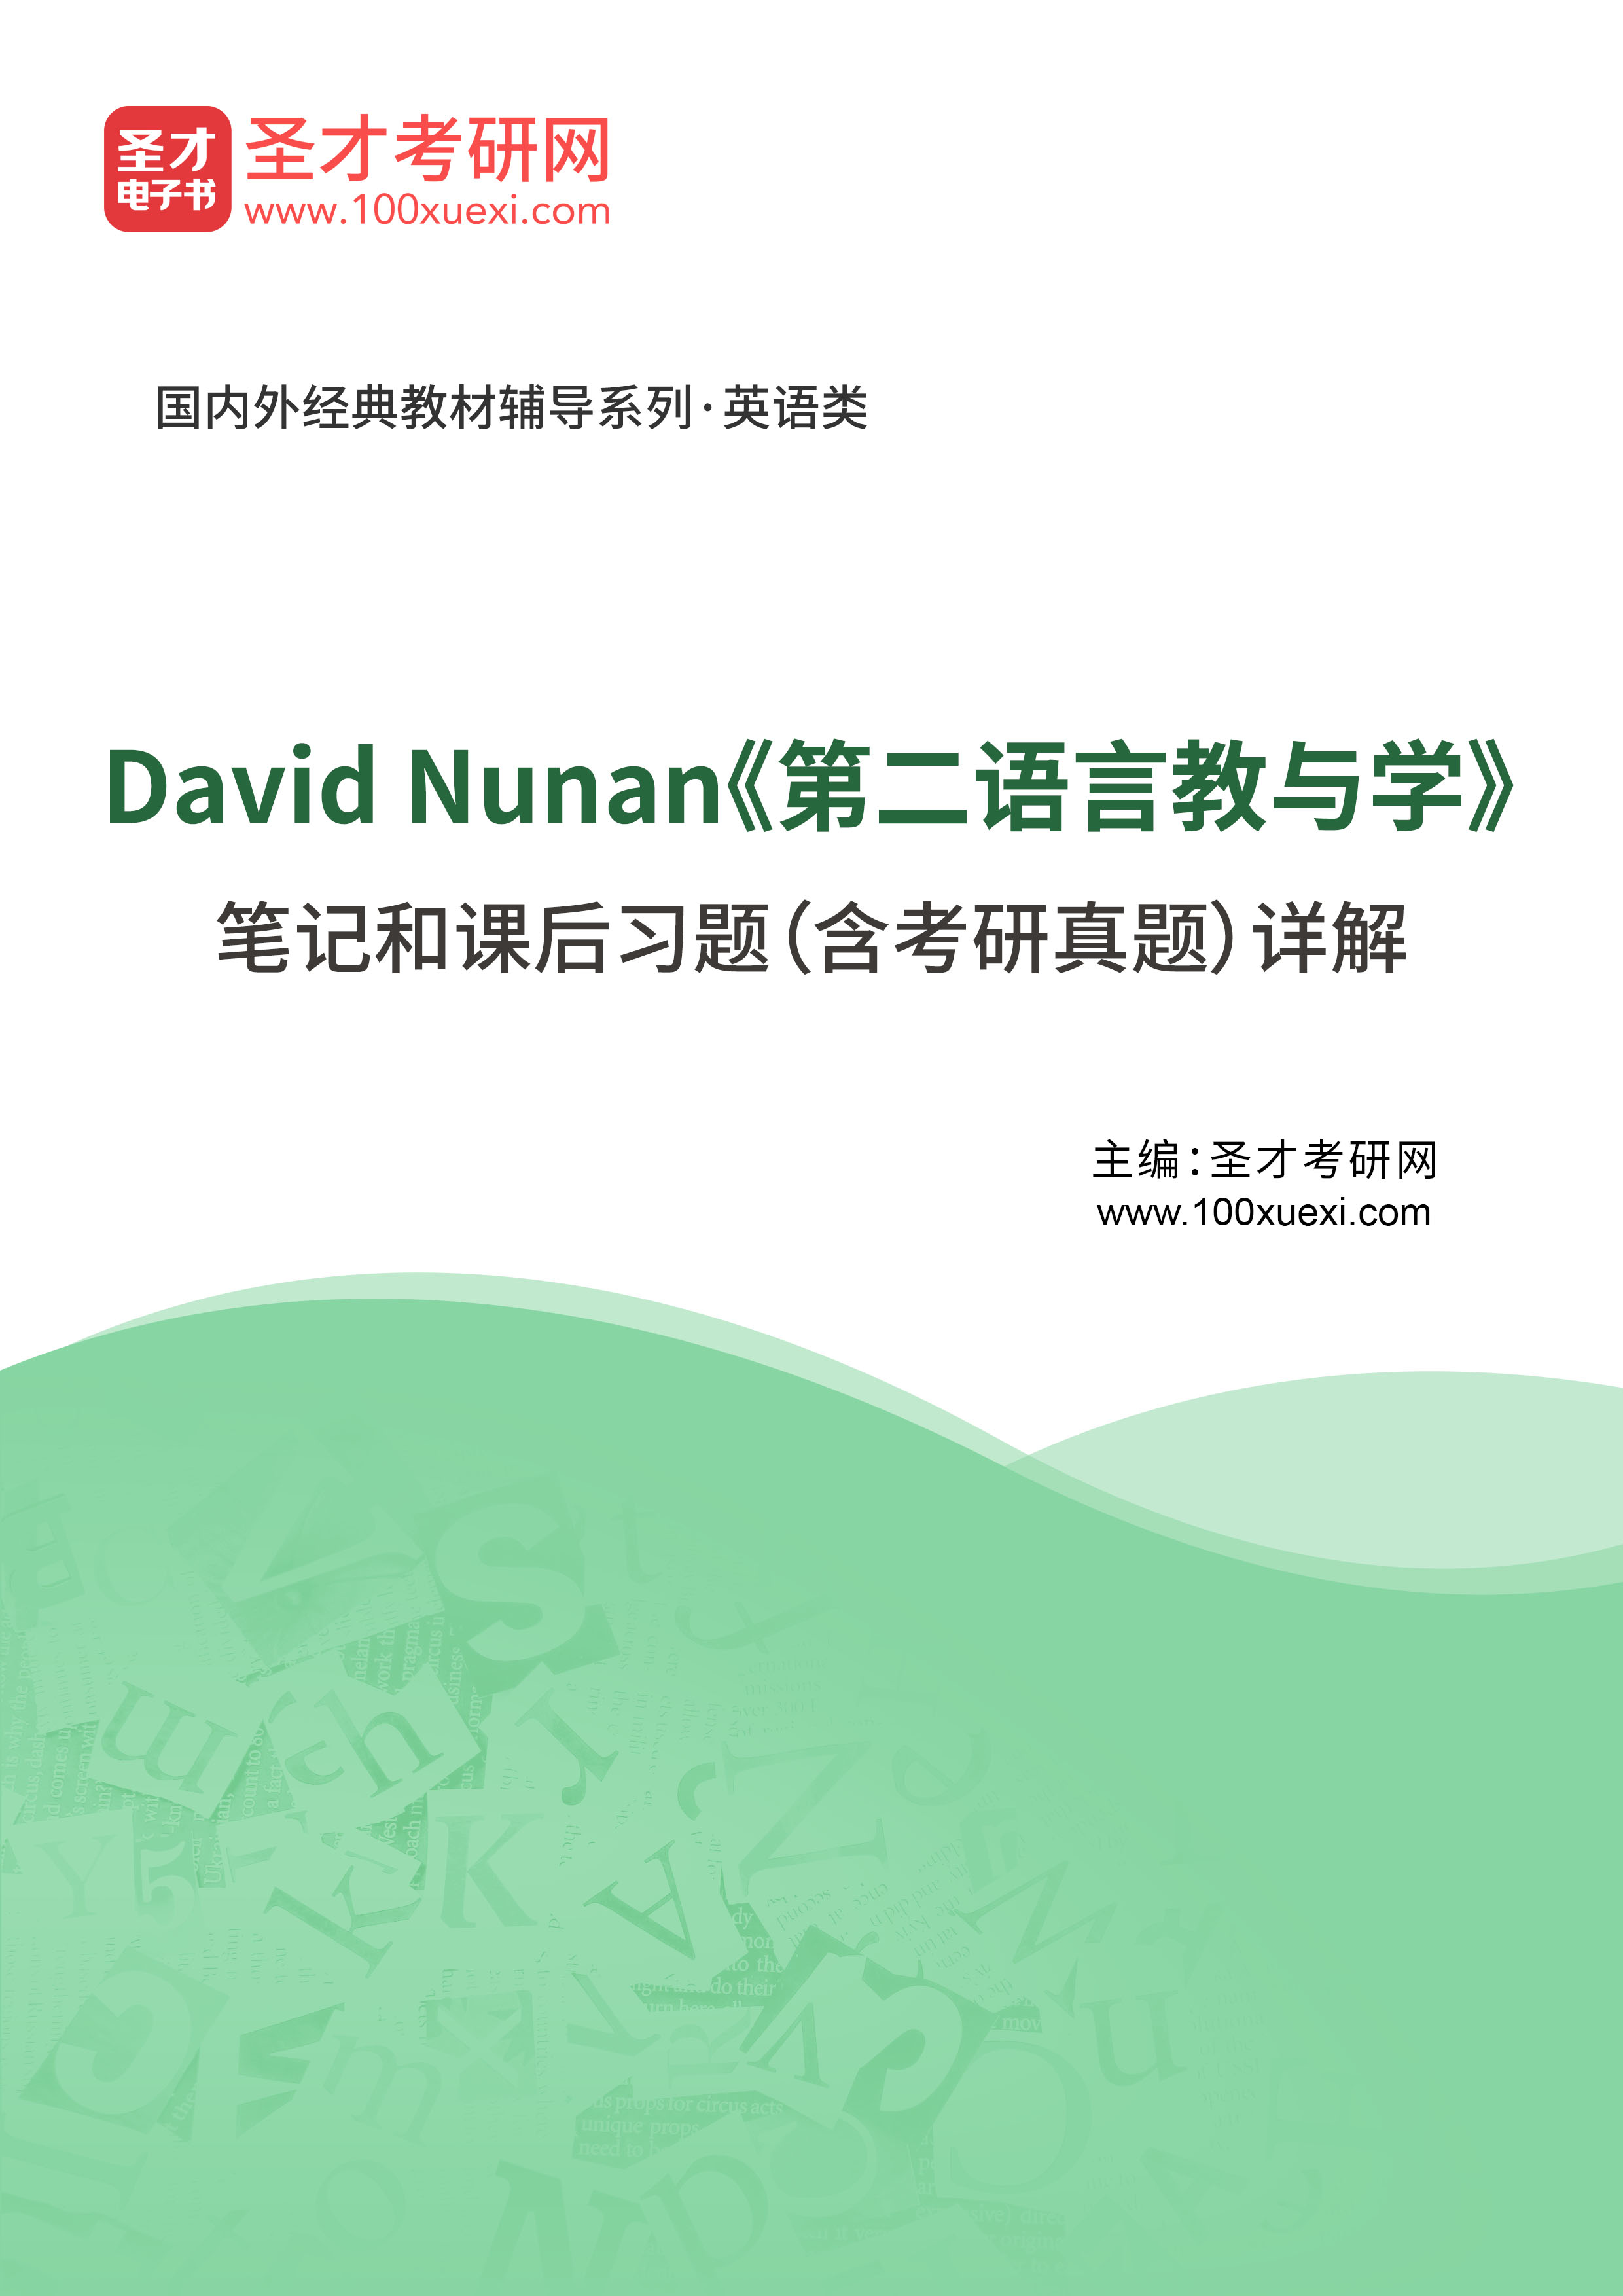 David Nunan《第二语言教与学》笔记和课后习题(含考研真题)详解